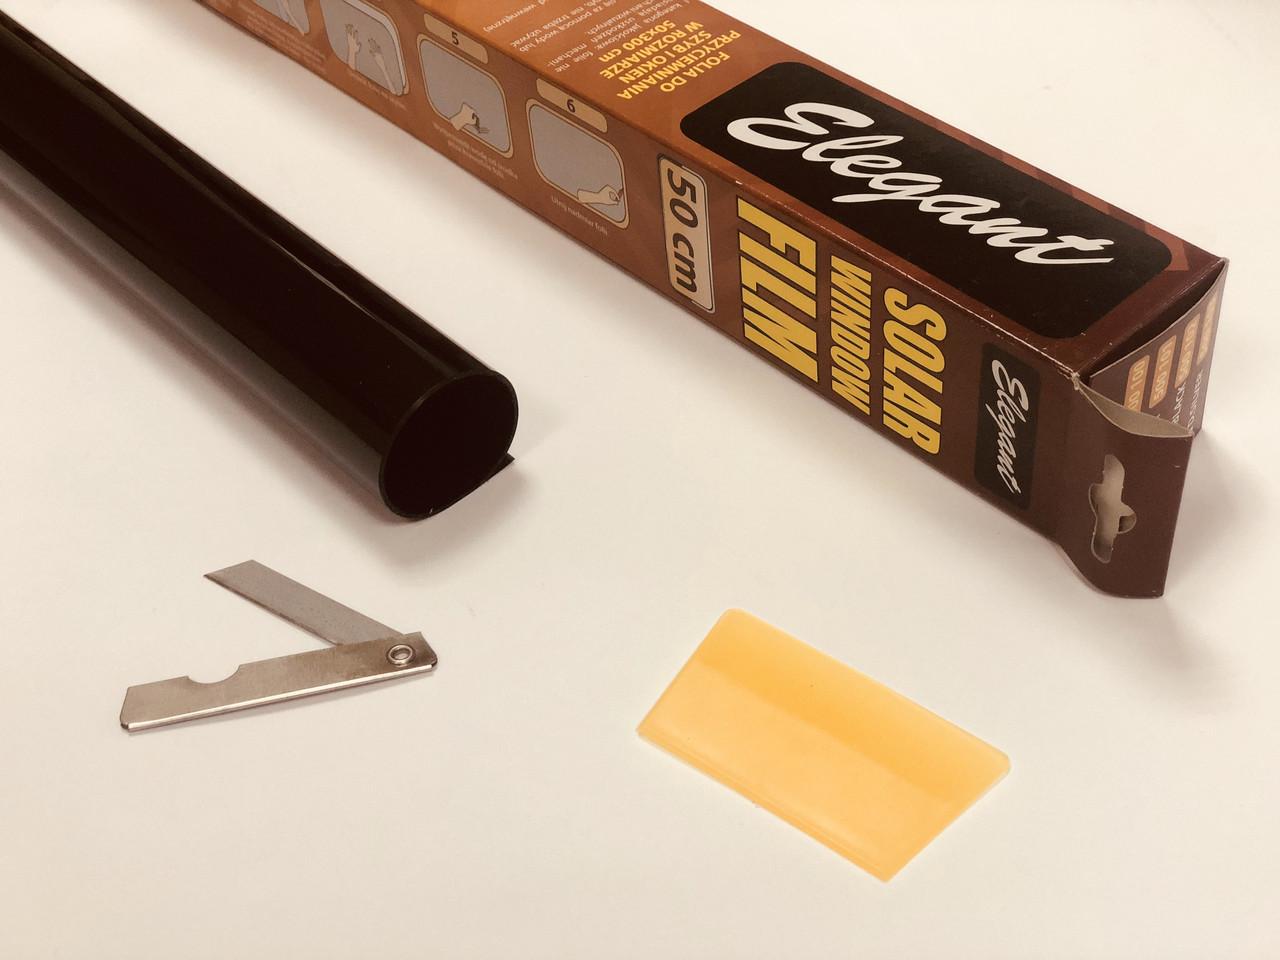 Тонувальна плівка 0.5х3 м S. D. BLACK з антицарапным покриттям SRC 23 мкм Elegant Plus EL 500152